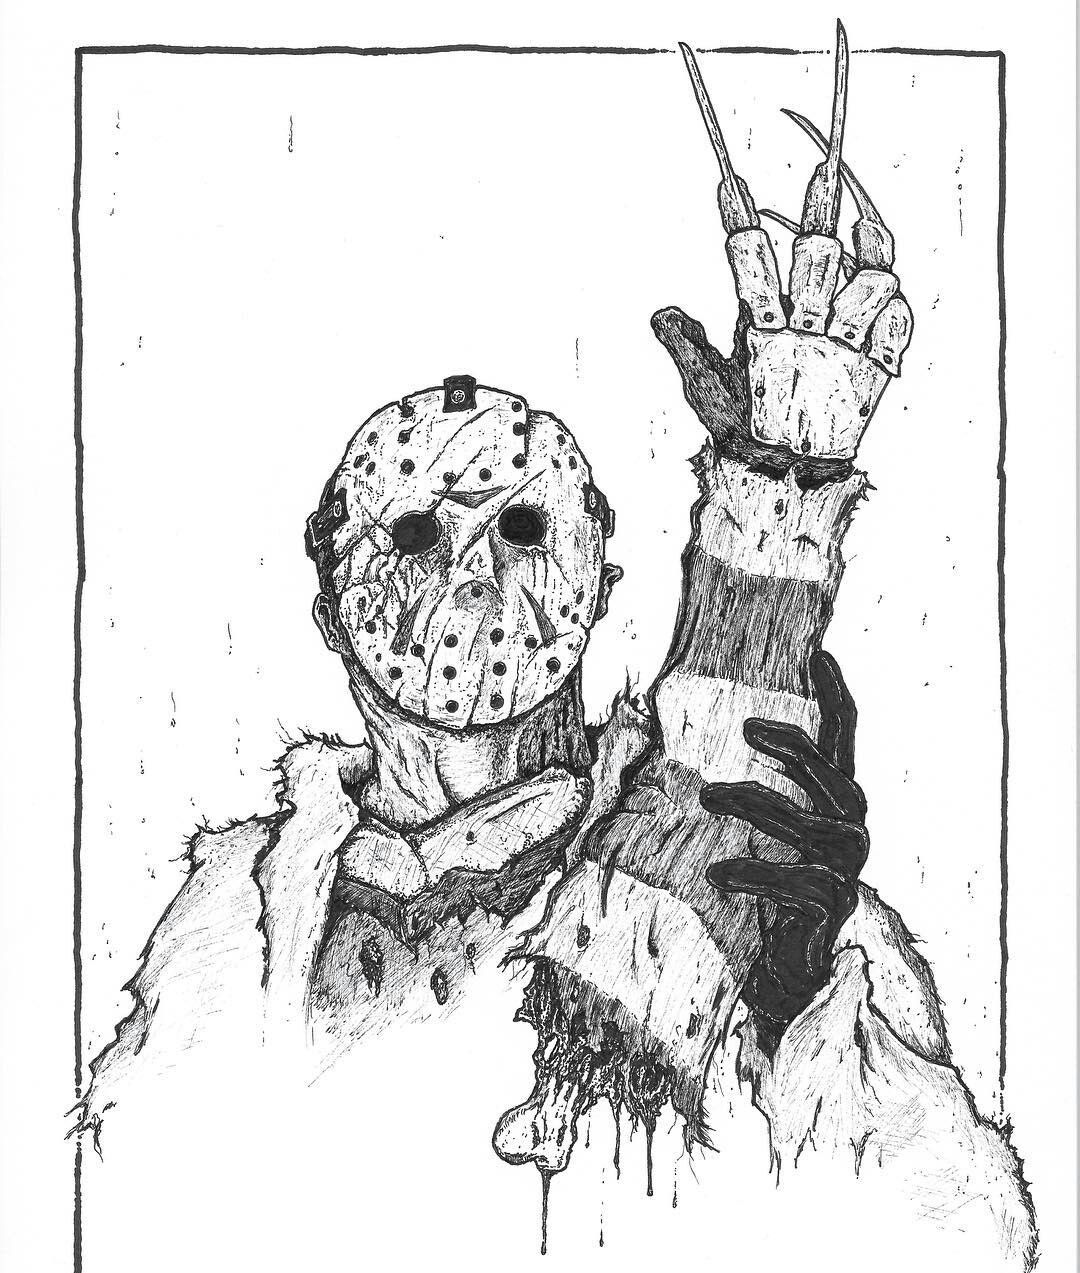 Pin by The Slasher on Freddy vs Jason Horror art